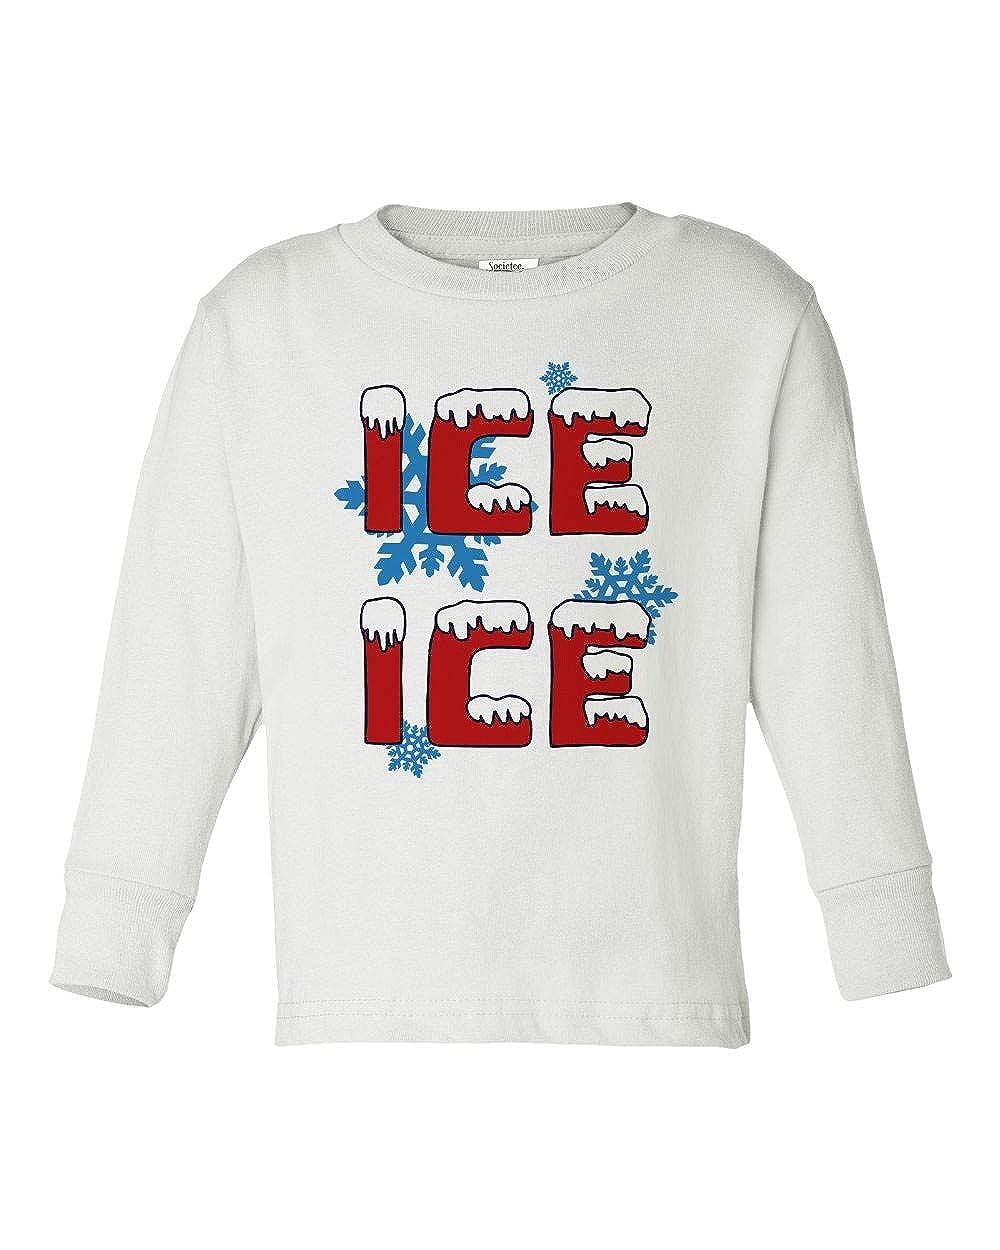 Societee Ice Ice Christmas Snow Cool Girls Boys Toddler Long Sleeve T-Shirt